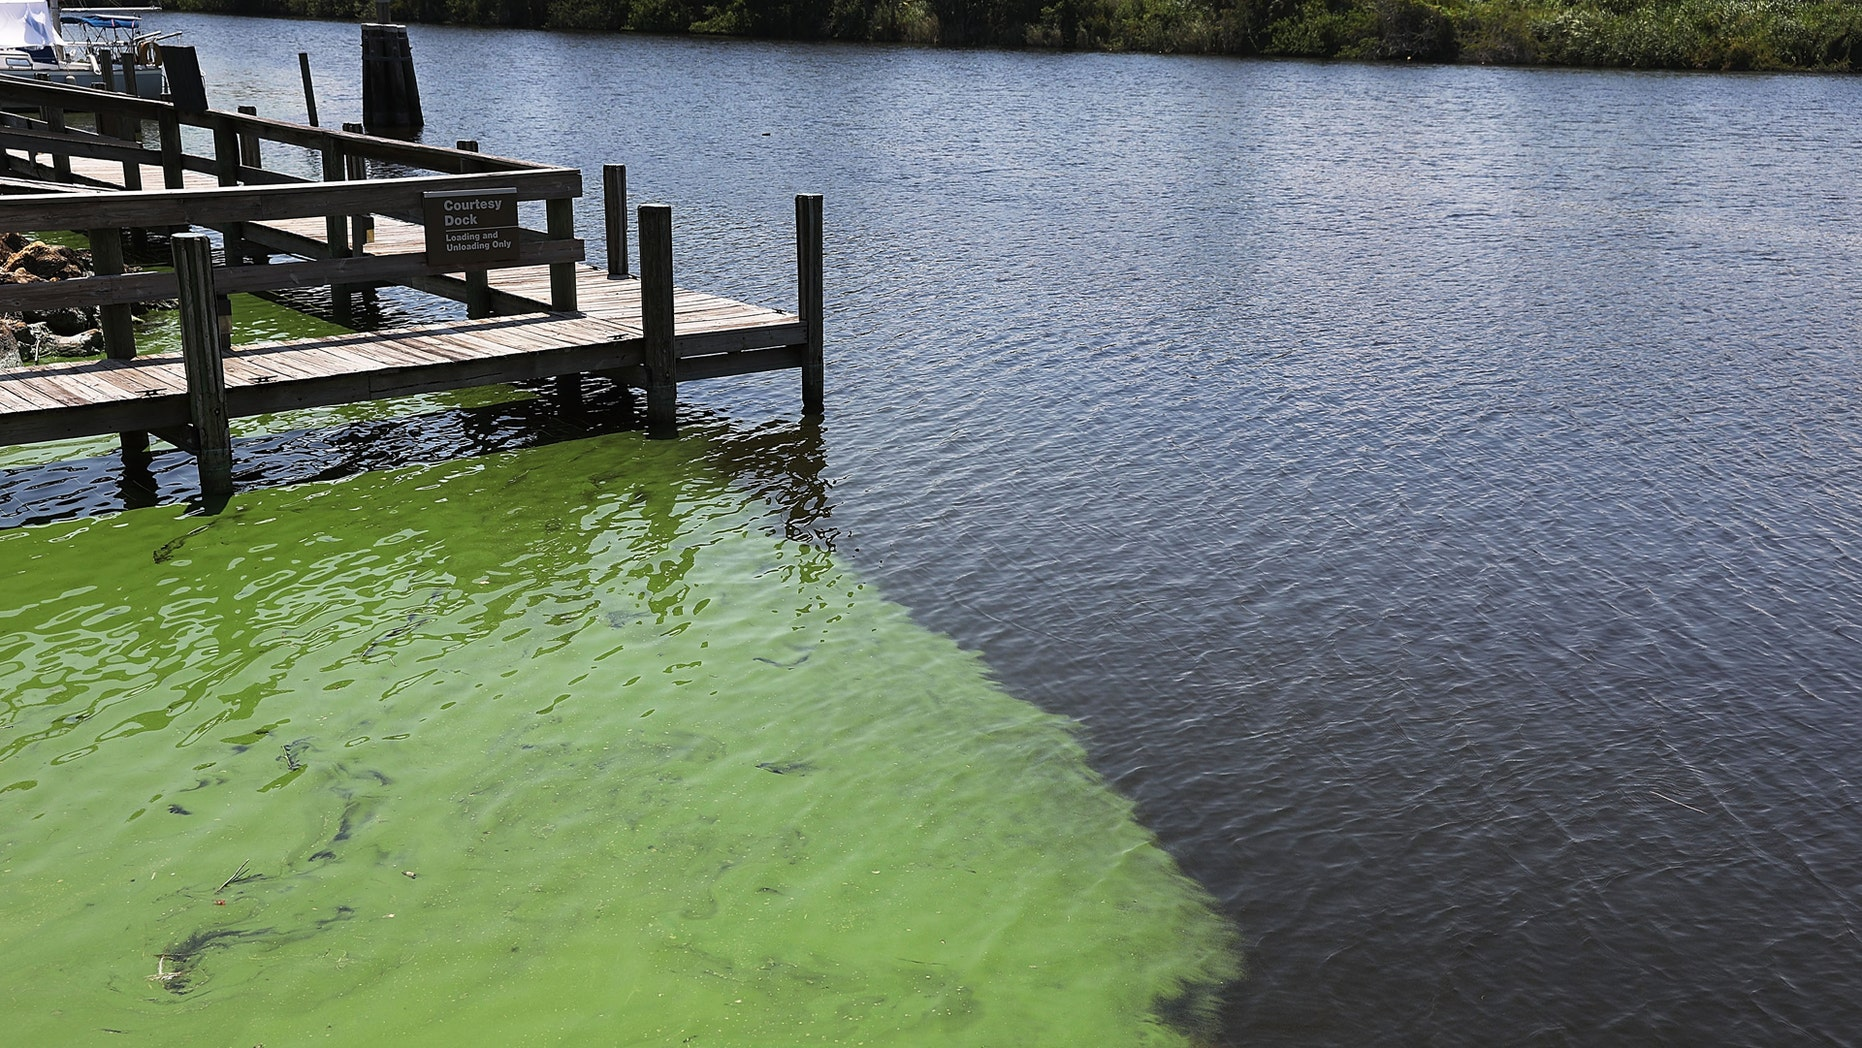 Blue Green Toxic Algae Invades Florida River Fox News